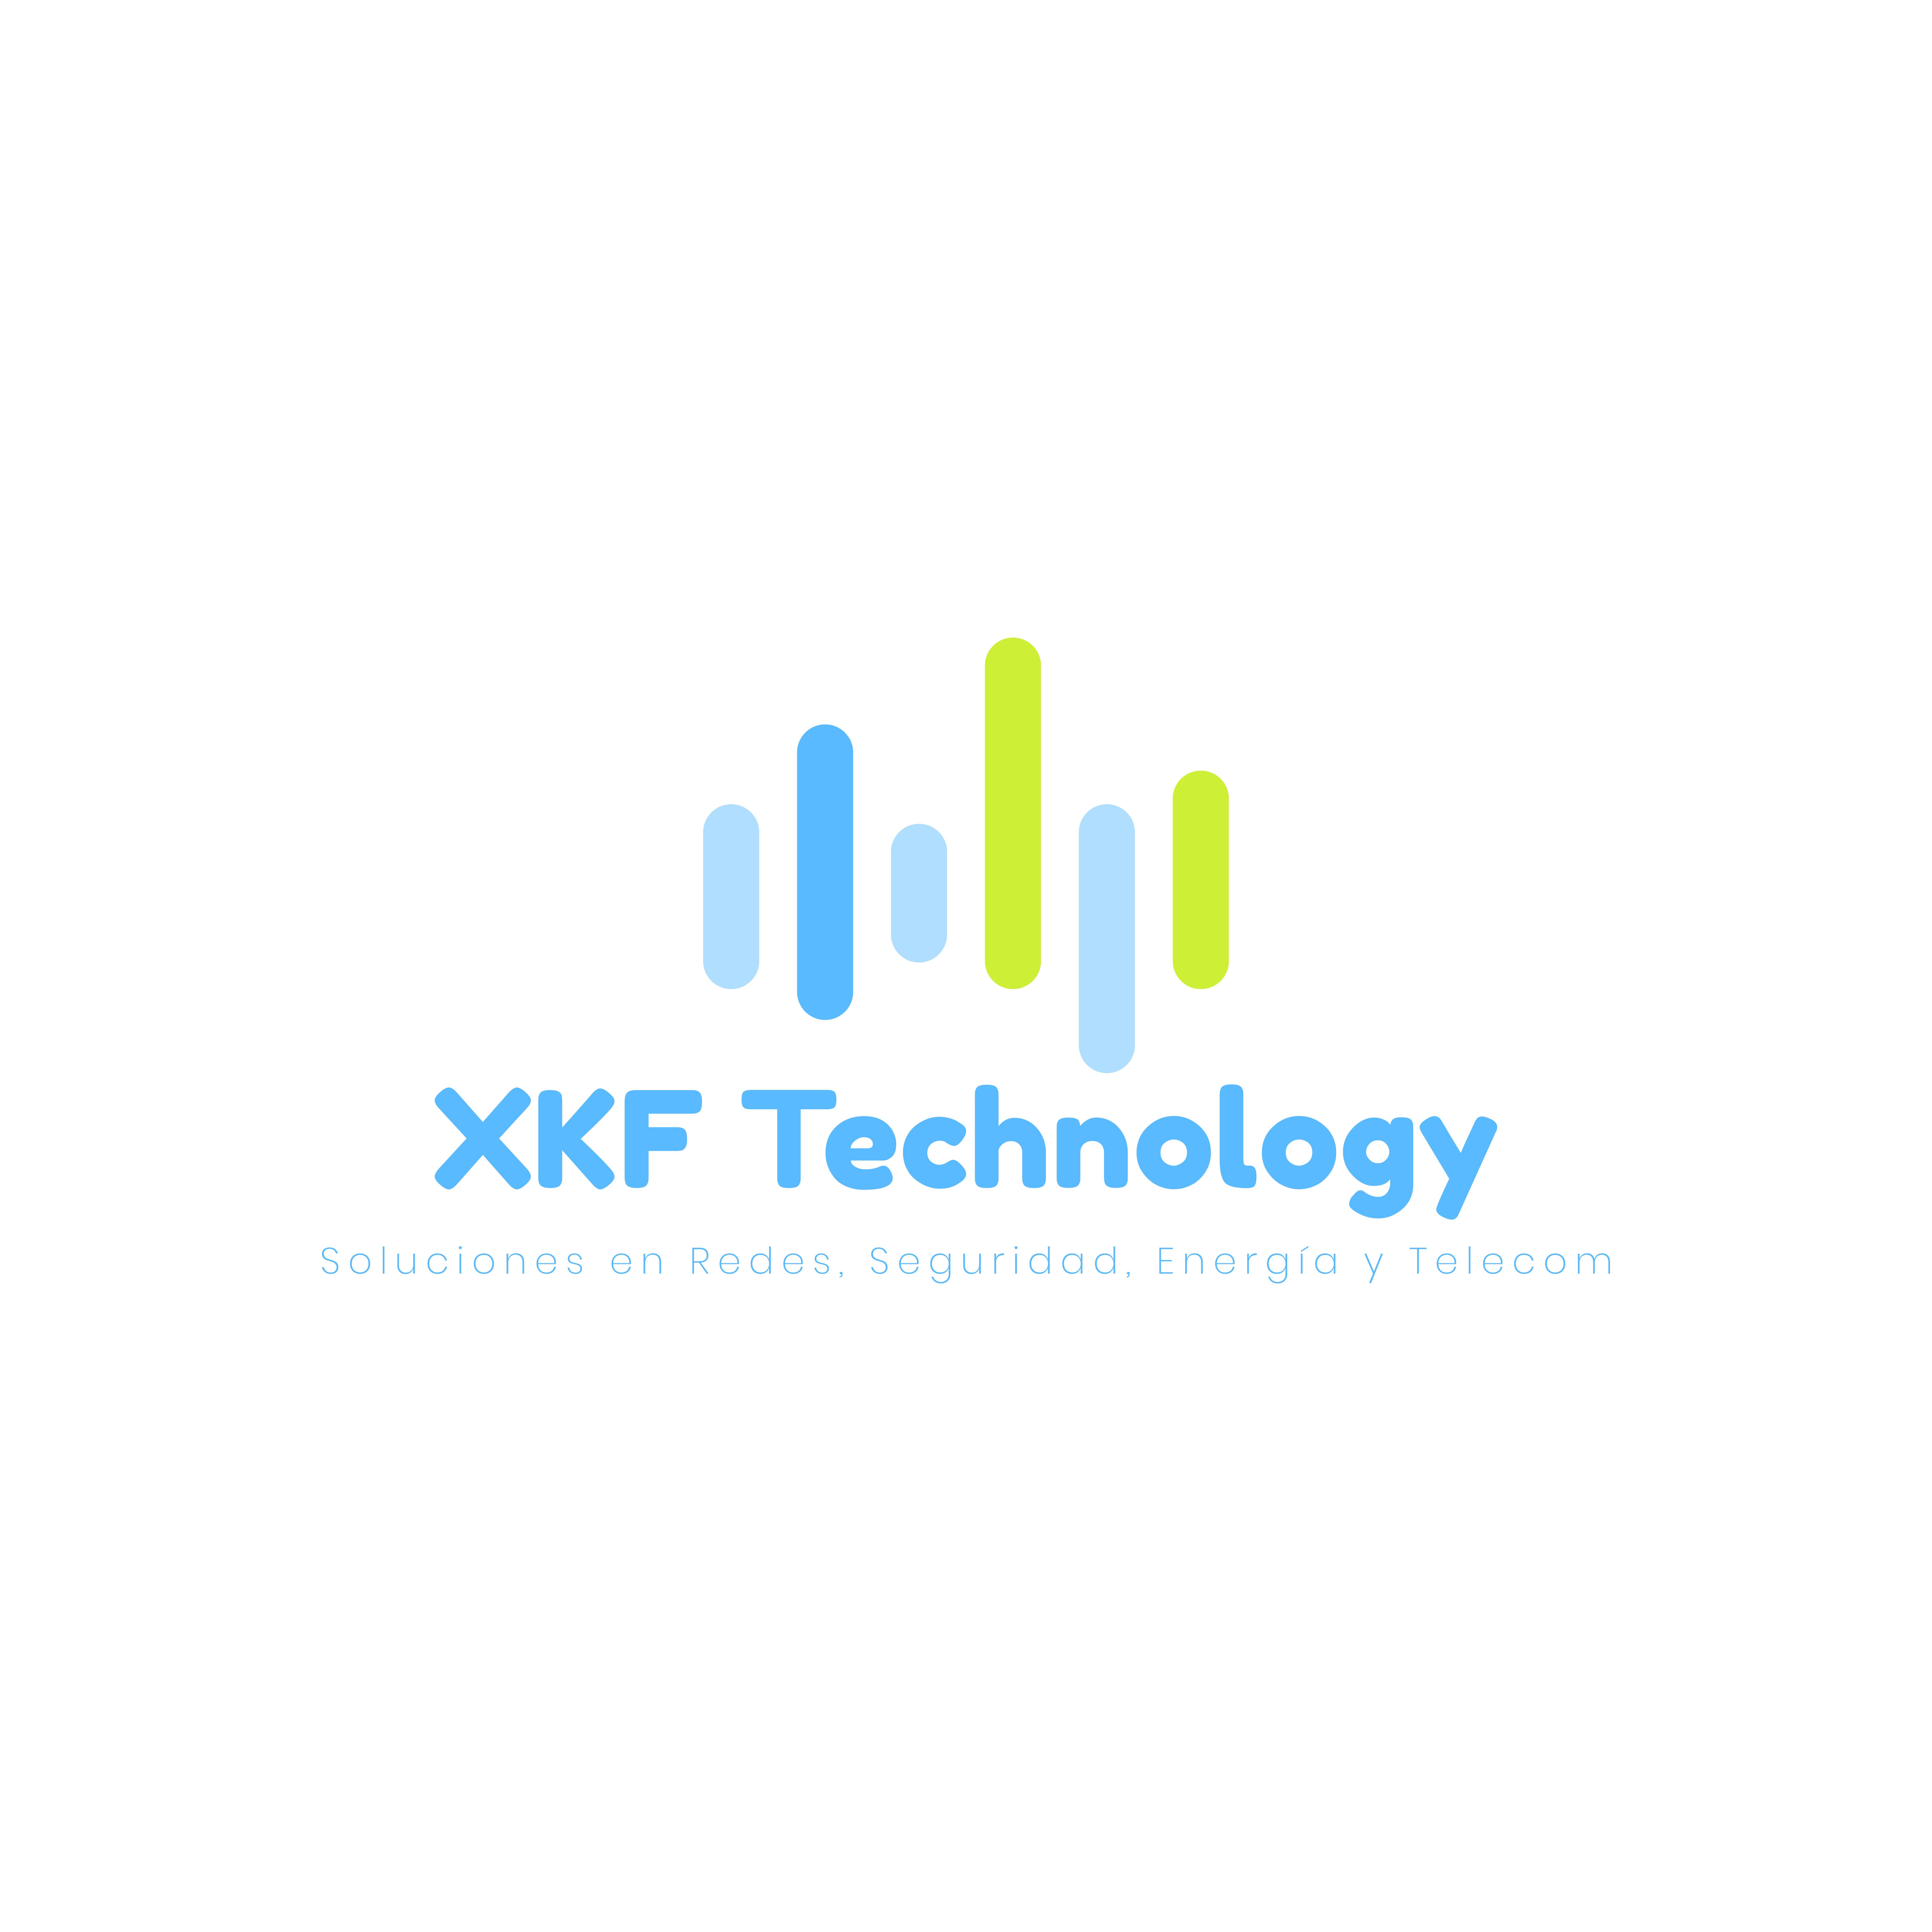 Xkf Technology